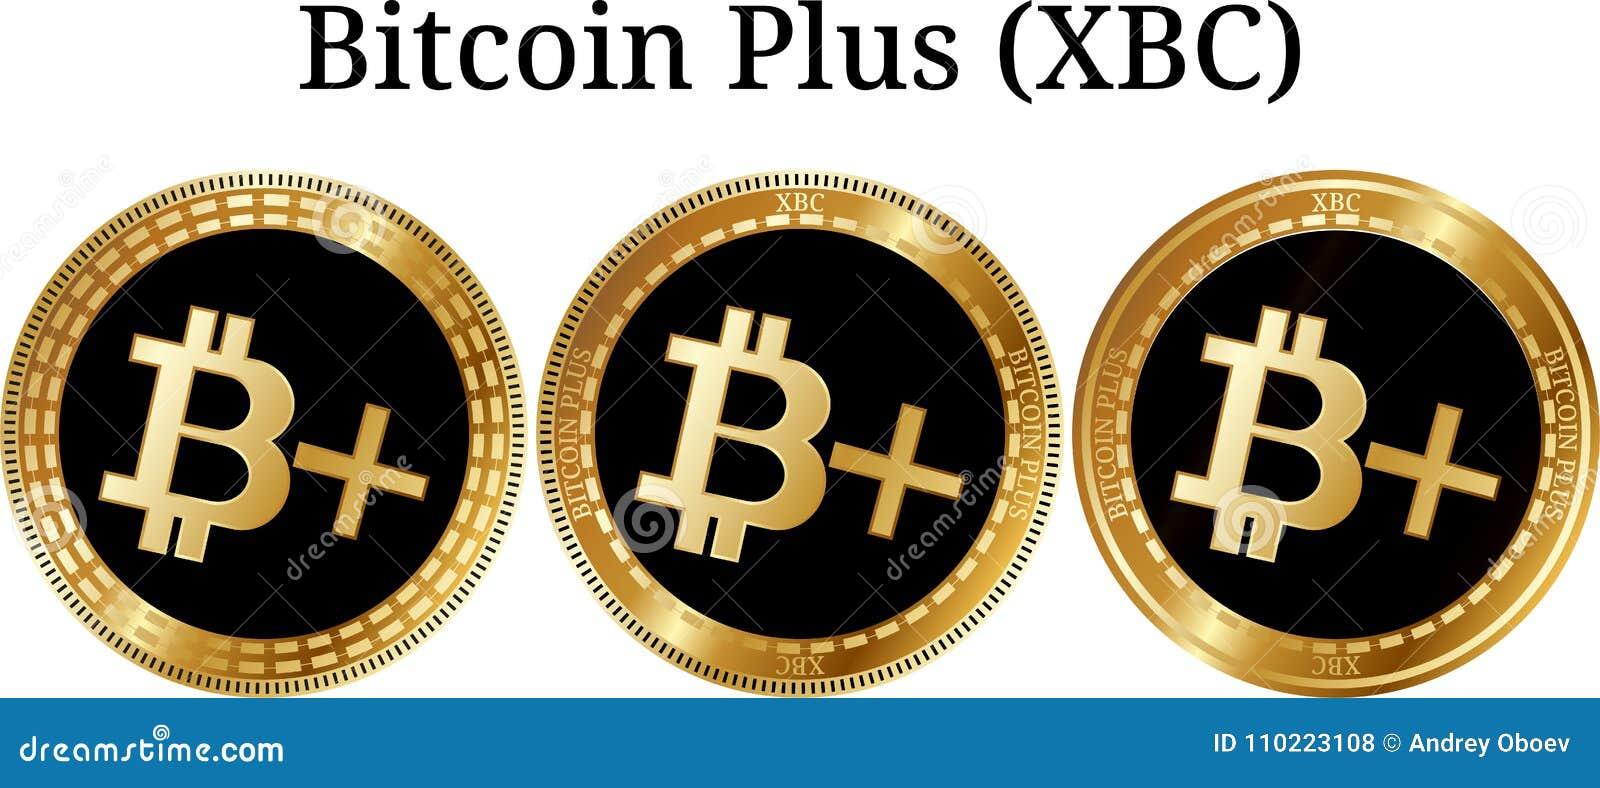 Bitcoin plus xbc